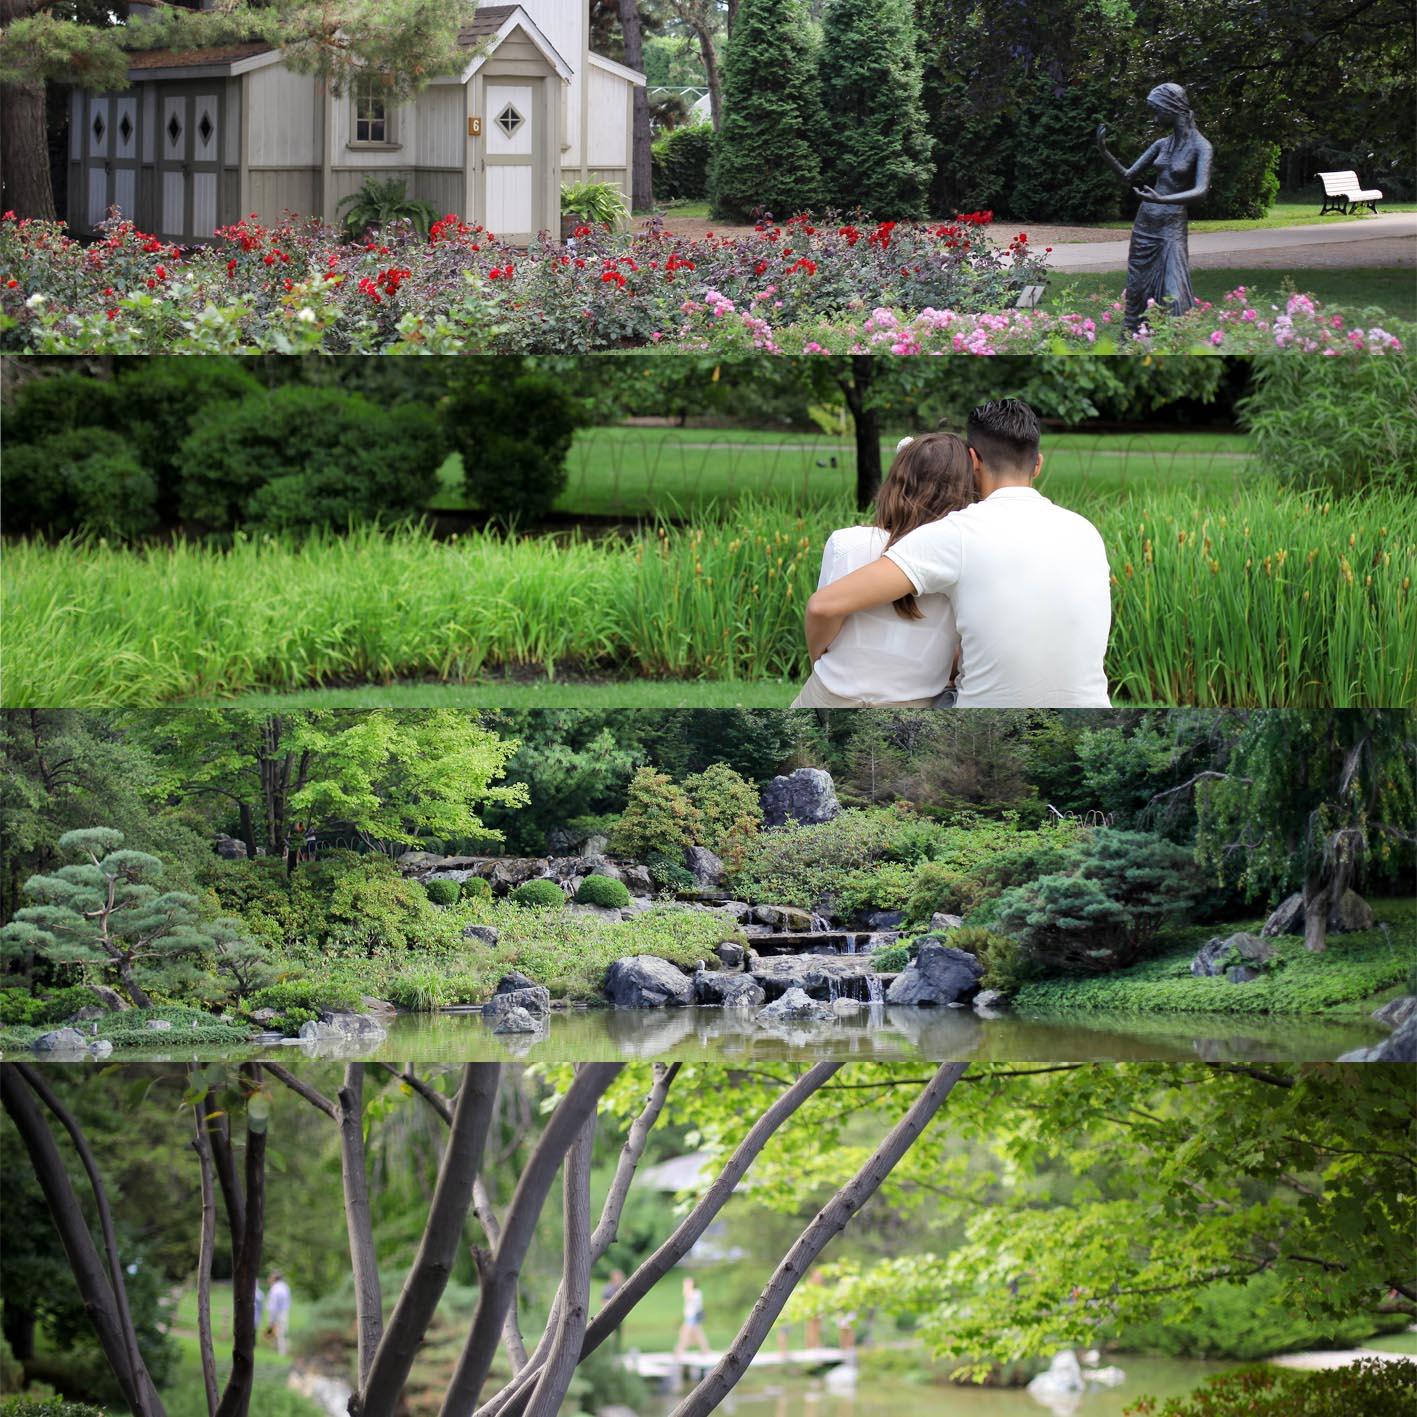 Jardin botanique montr al on met les voiles blog voyage for Jardin botanique hiver 2015